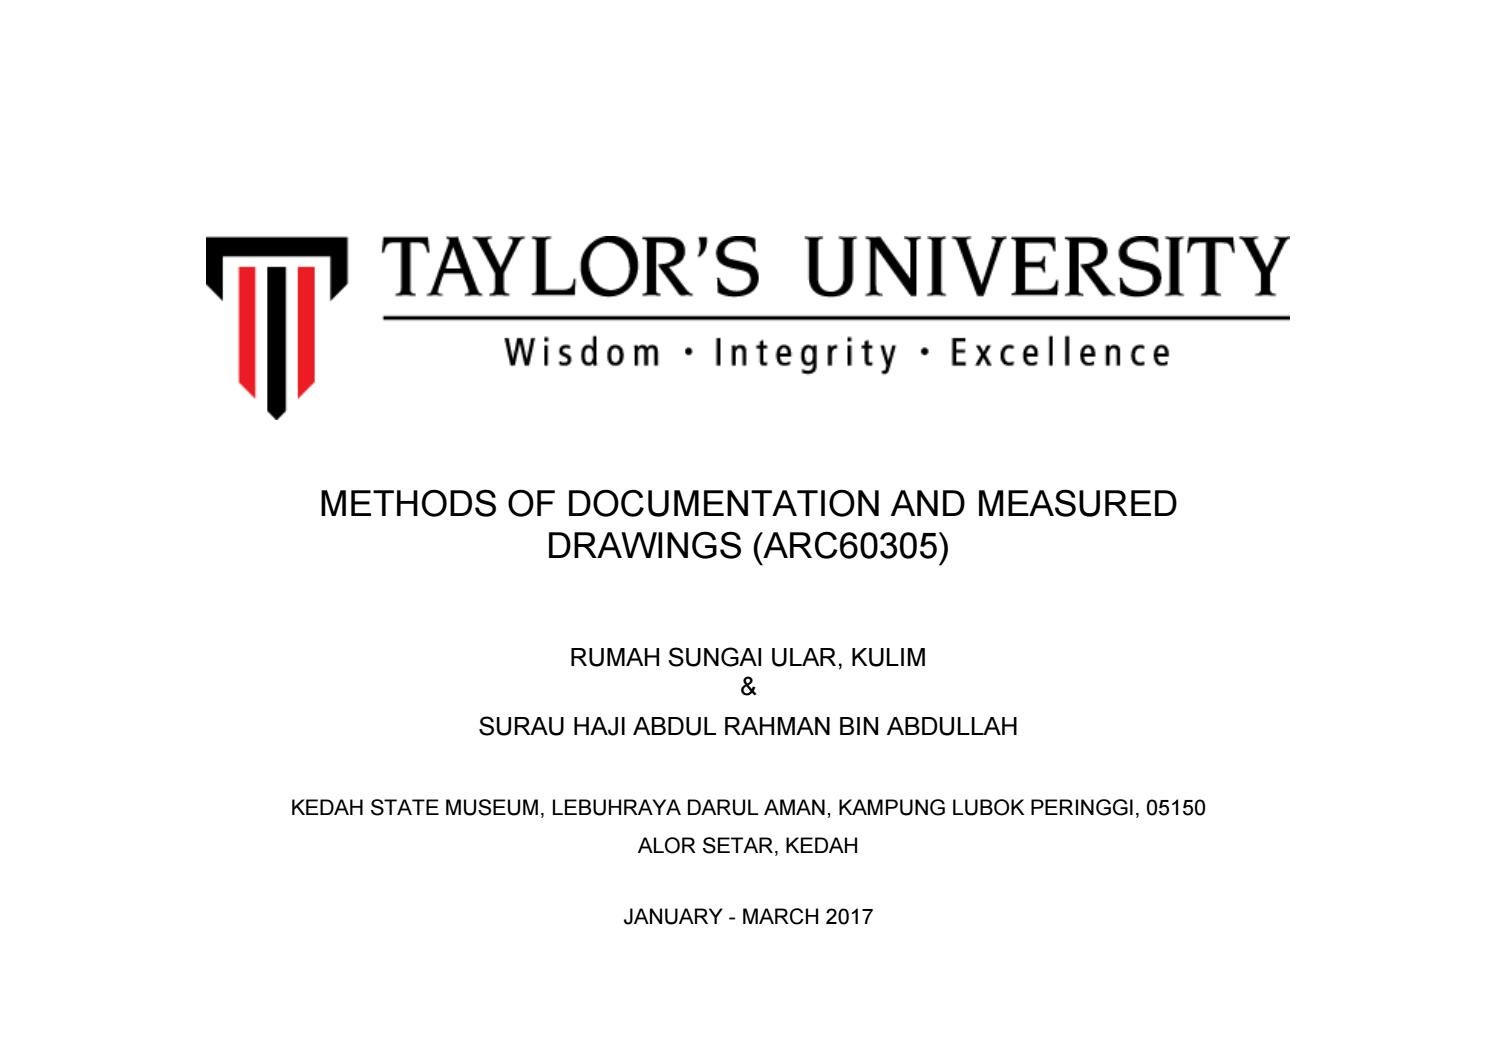 Kedah report kedah house surau by mirza qayyum issuu ccuart Choice Image